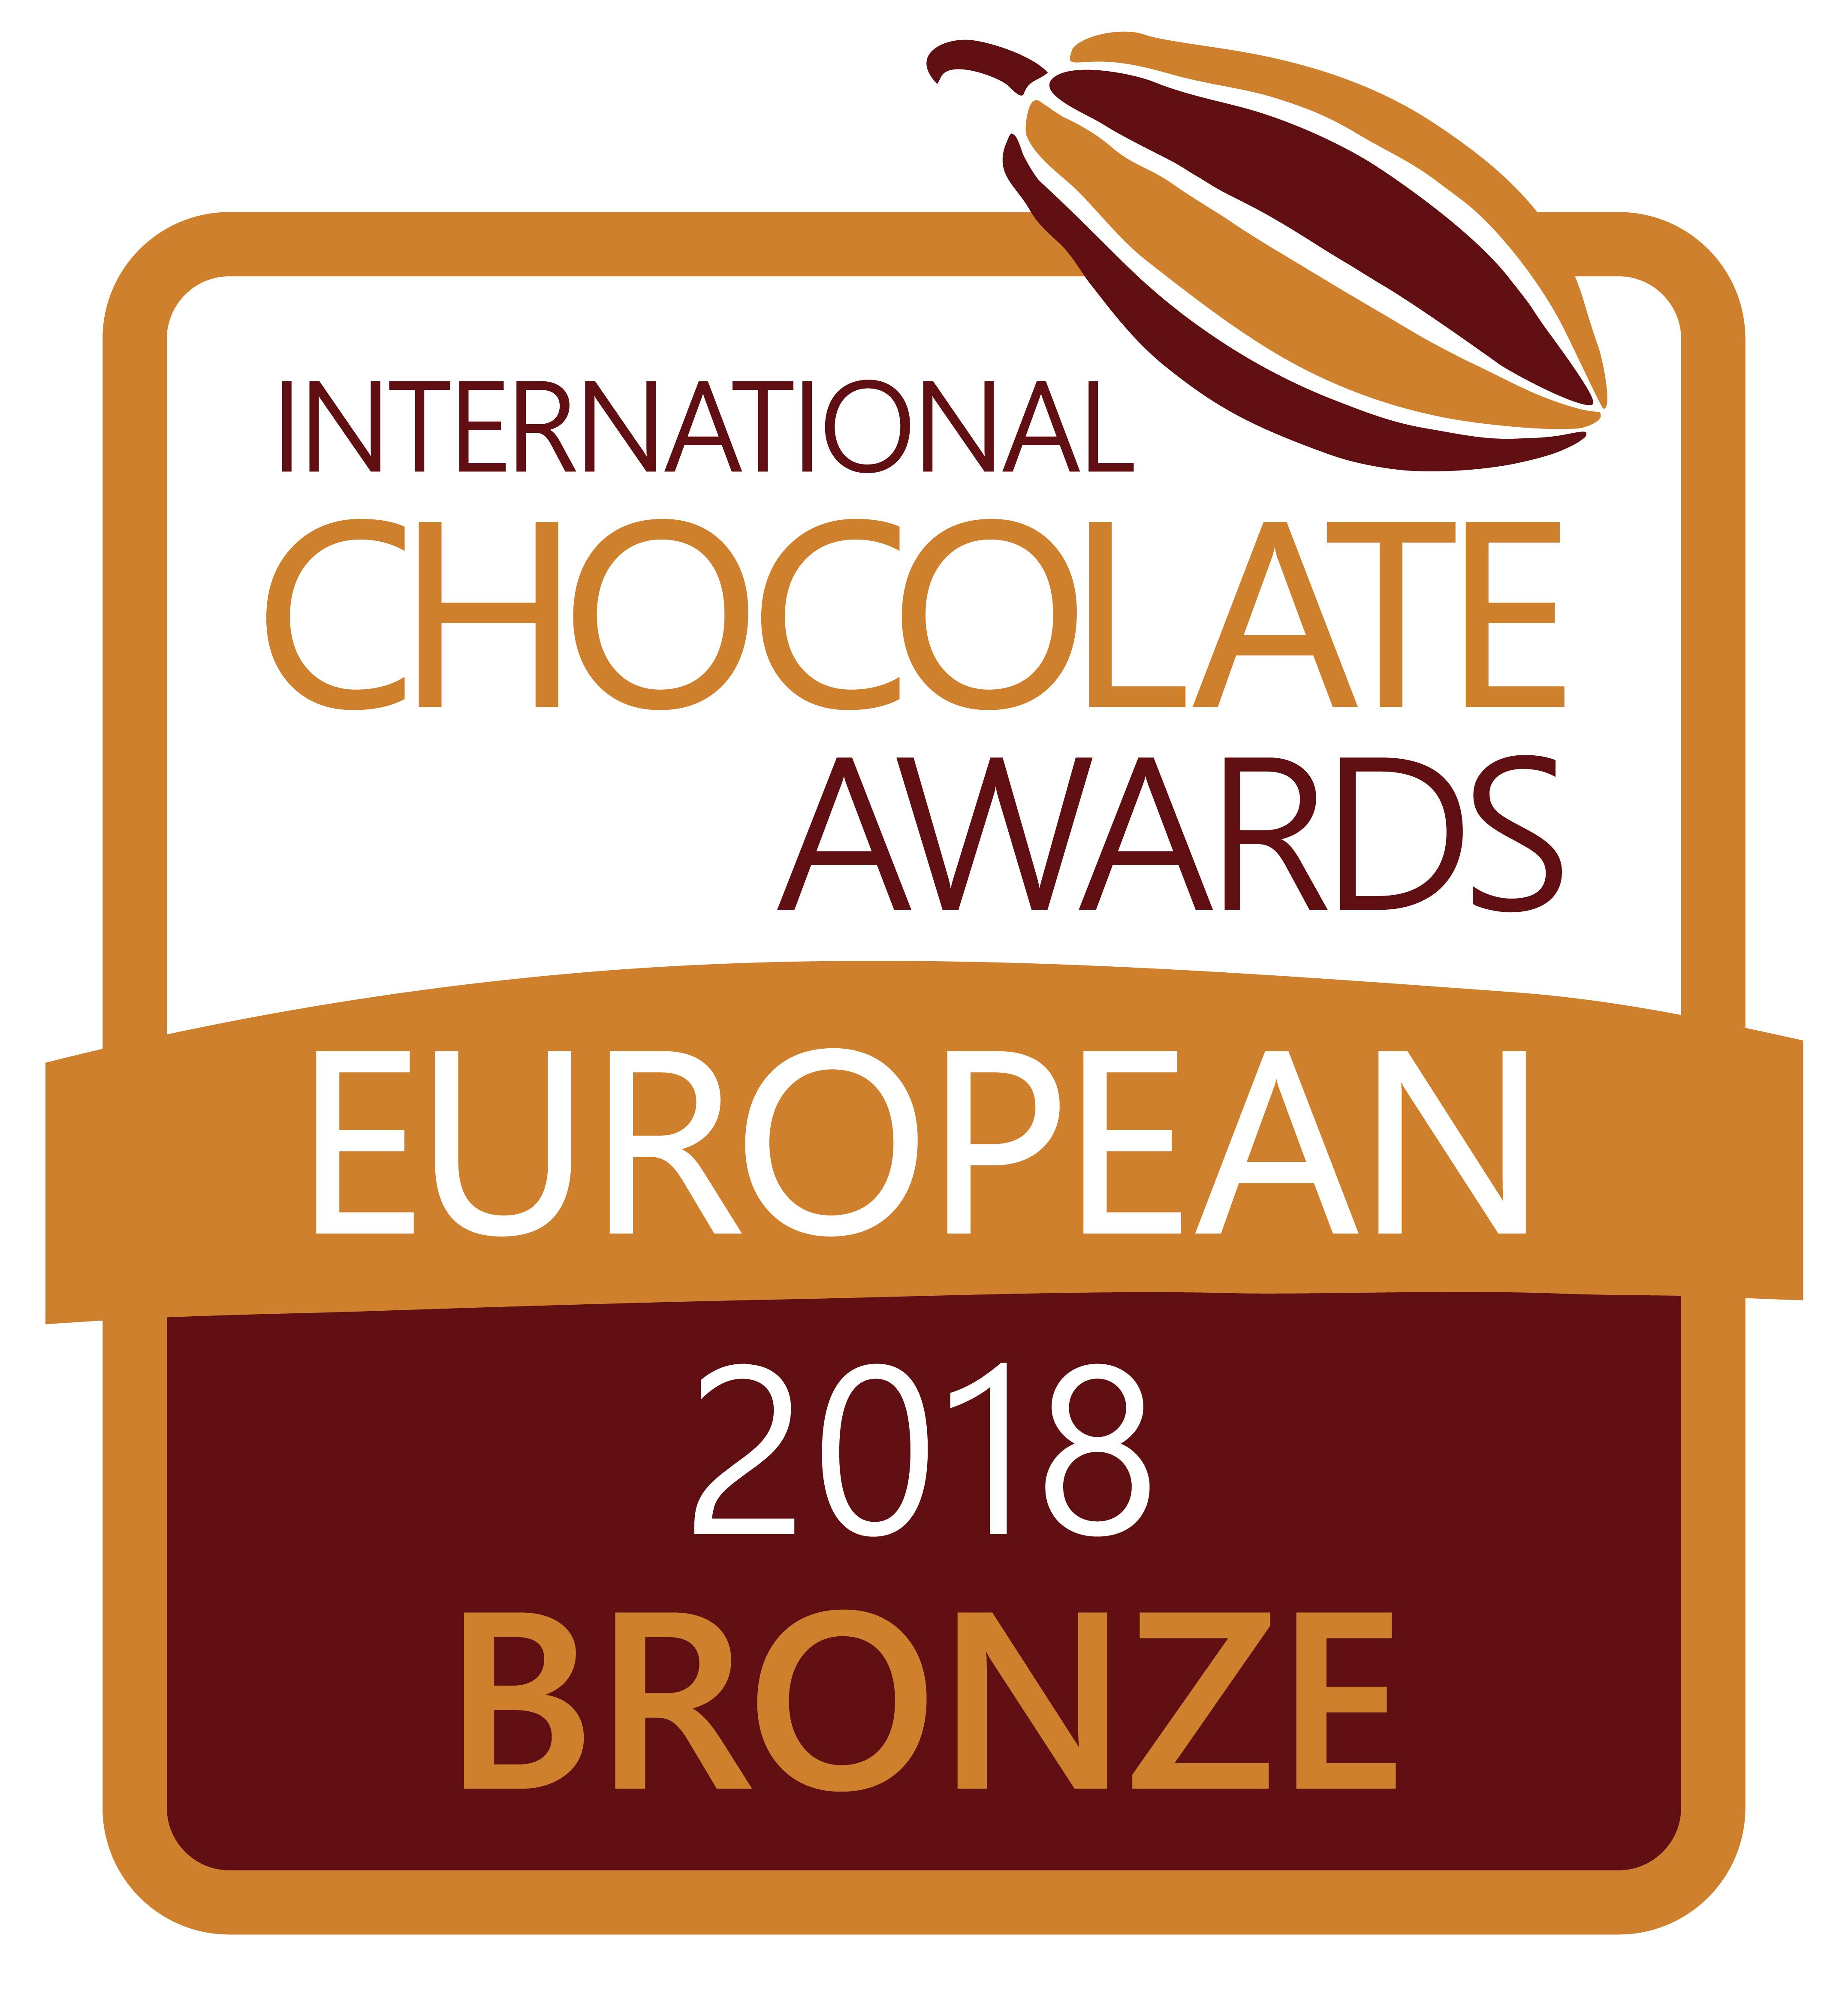 ica-prize-logo-2018-bronze-euro-rgb.jpg